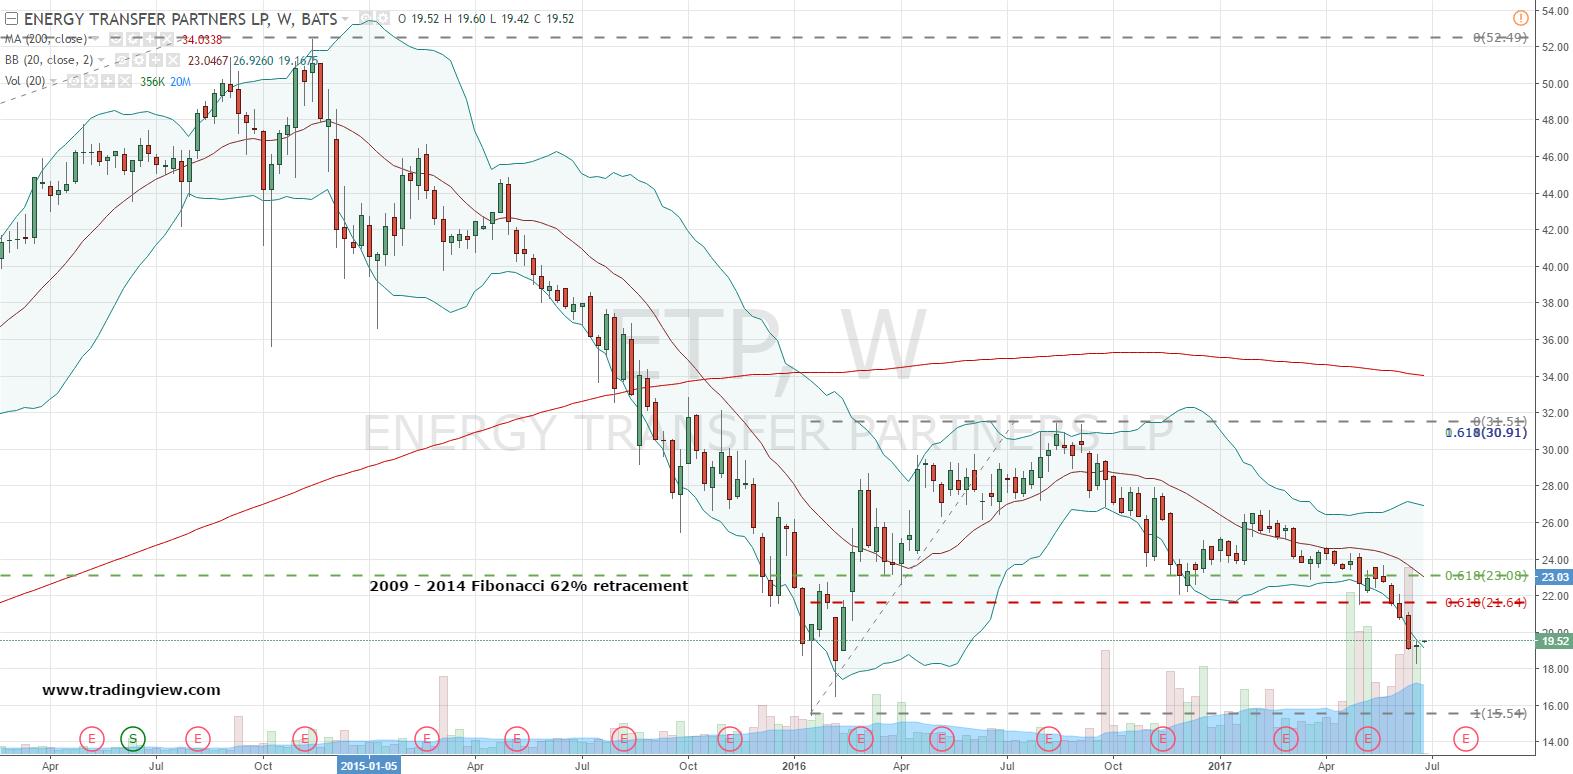 Etp Stock Quote Brilliant Etp Stock Don't Buy Energy Transfer Partners Lp Etp Stock For